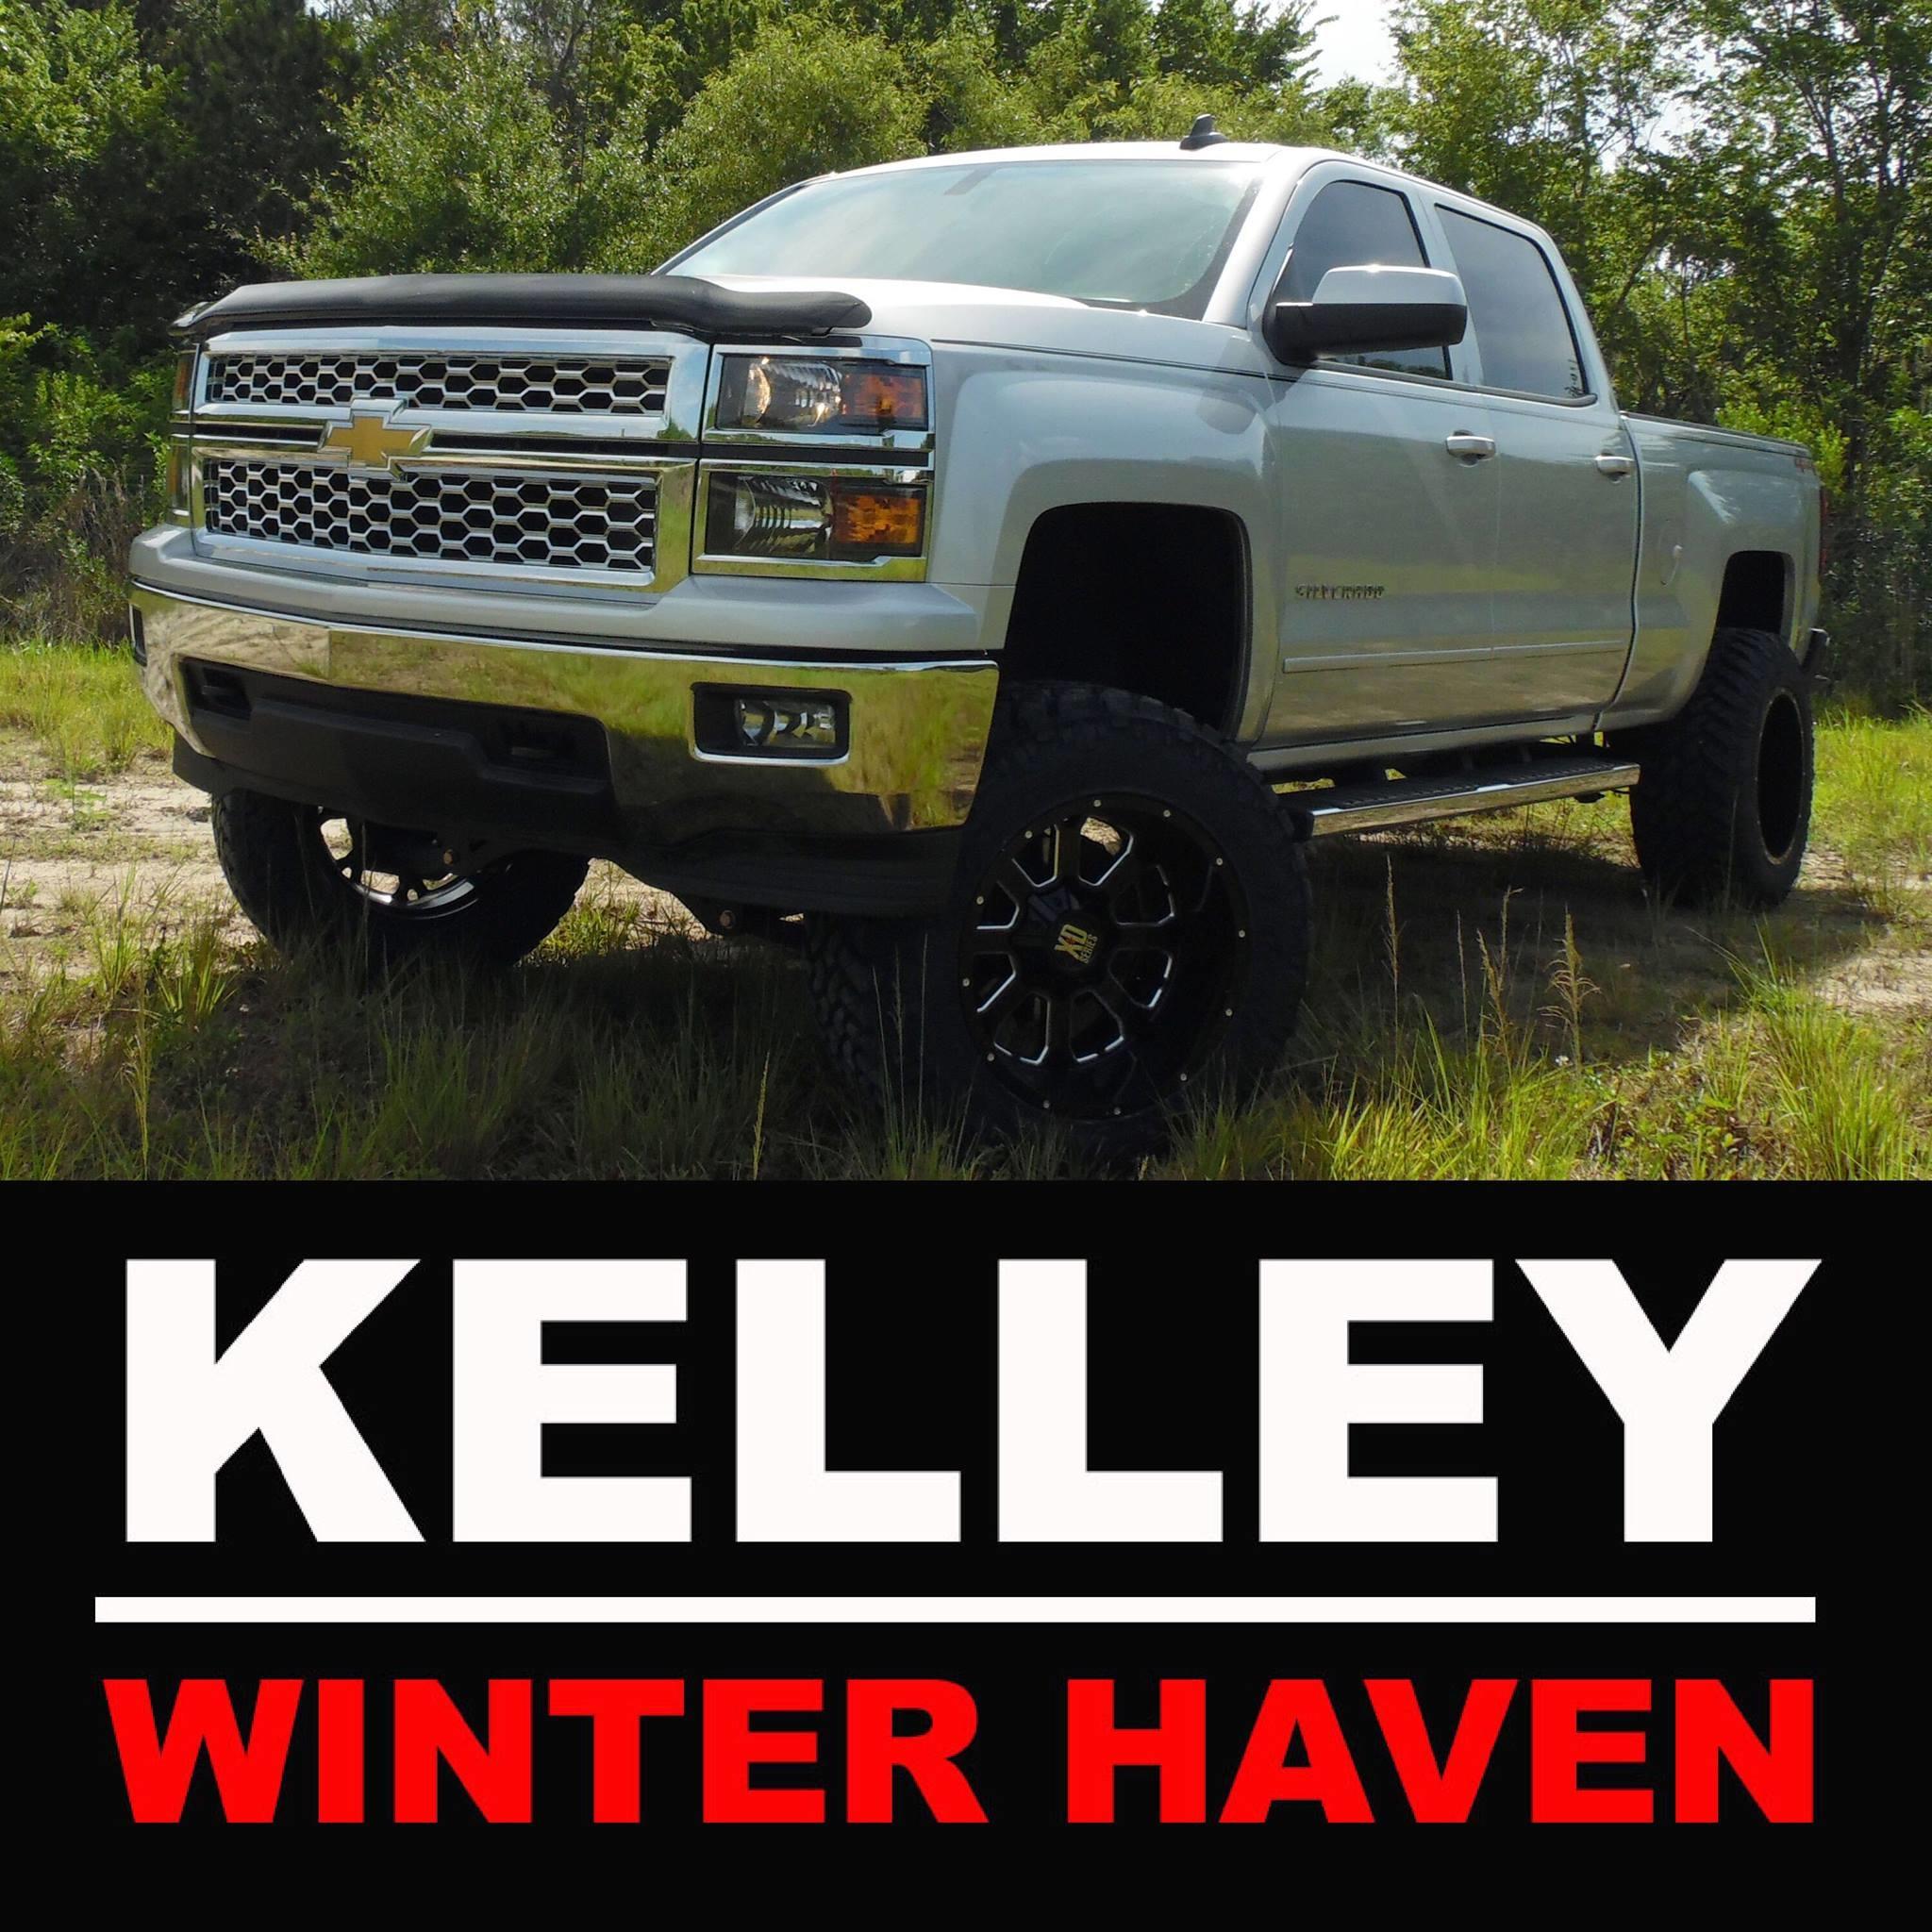 Kelley Winter Haven